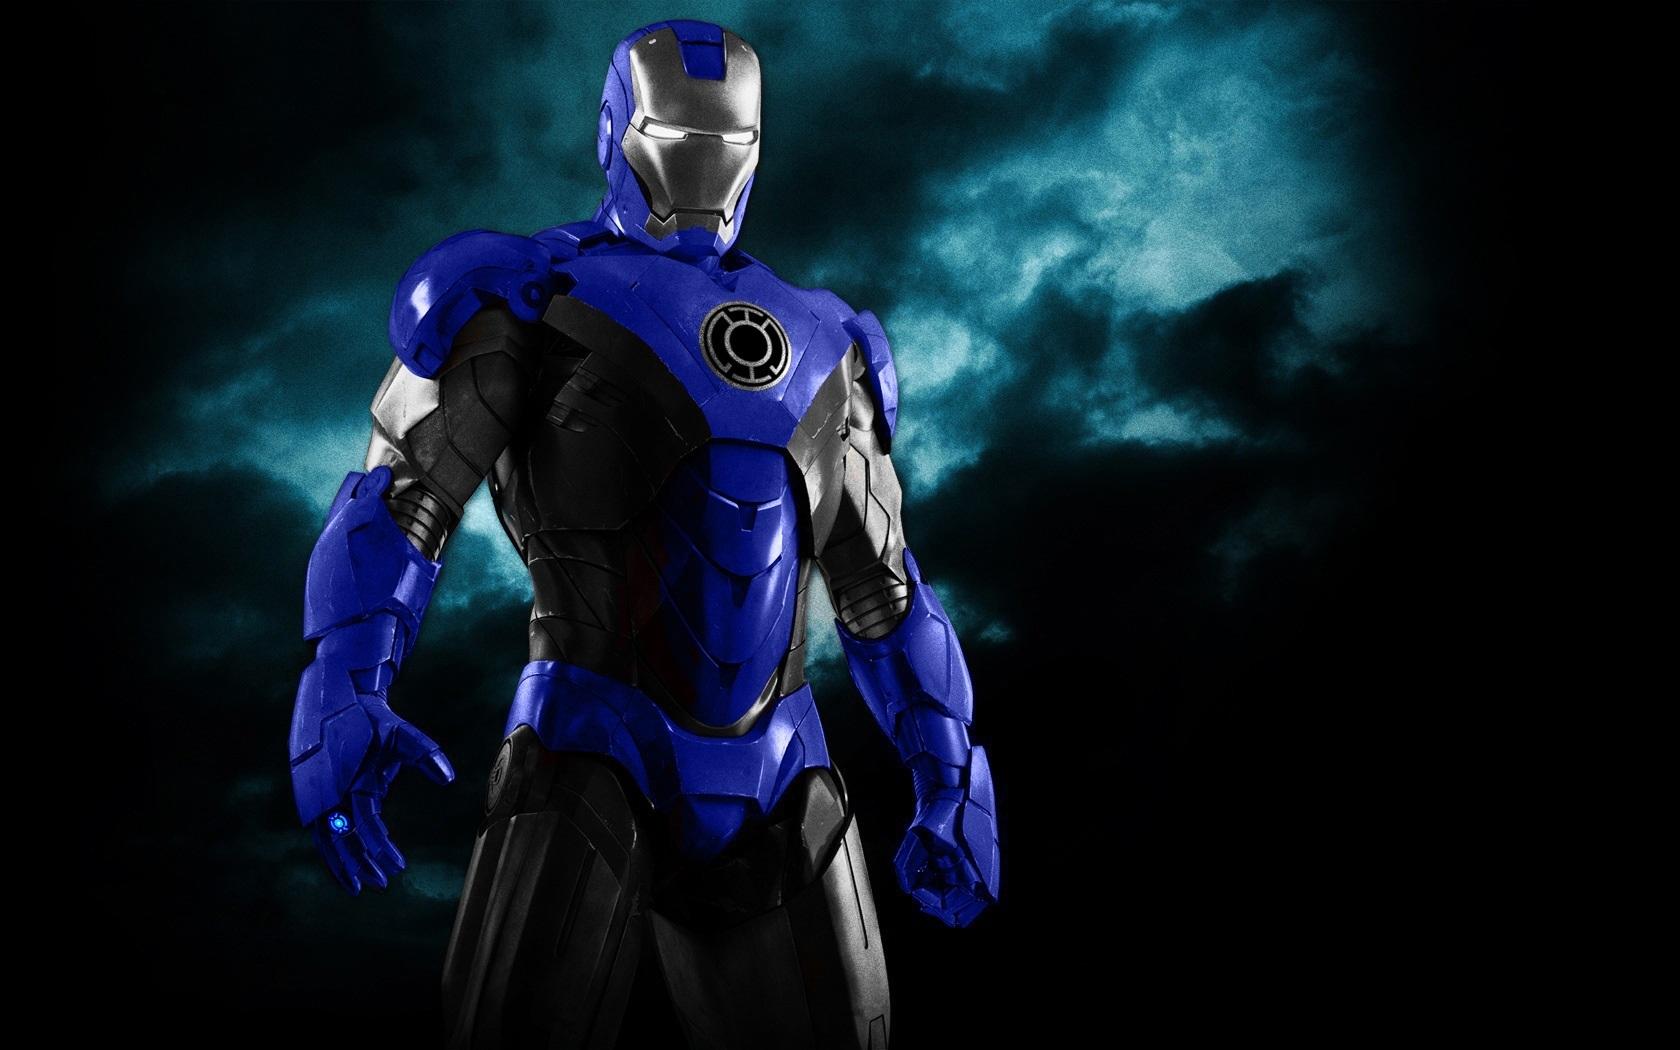 iron man blue lantern armor by 666darks customization wallpaper other 1680x1050